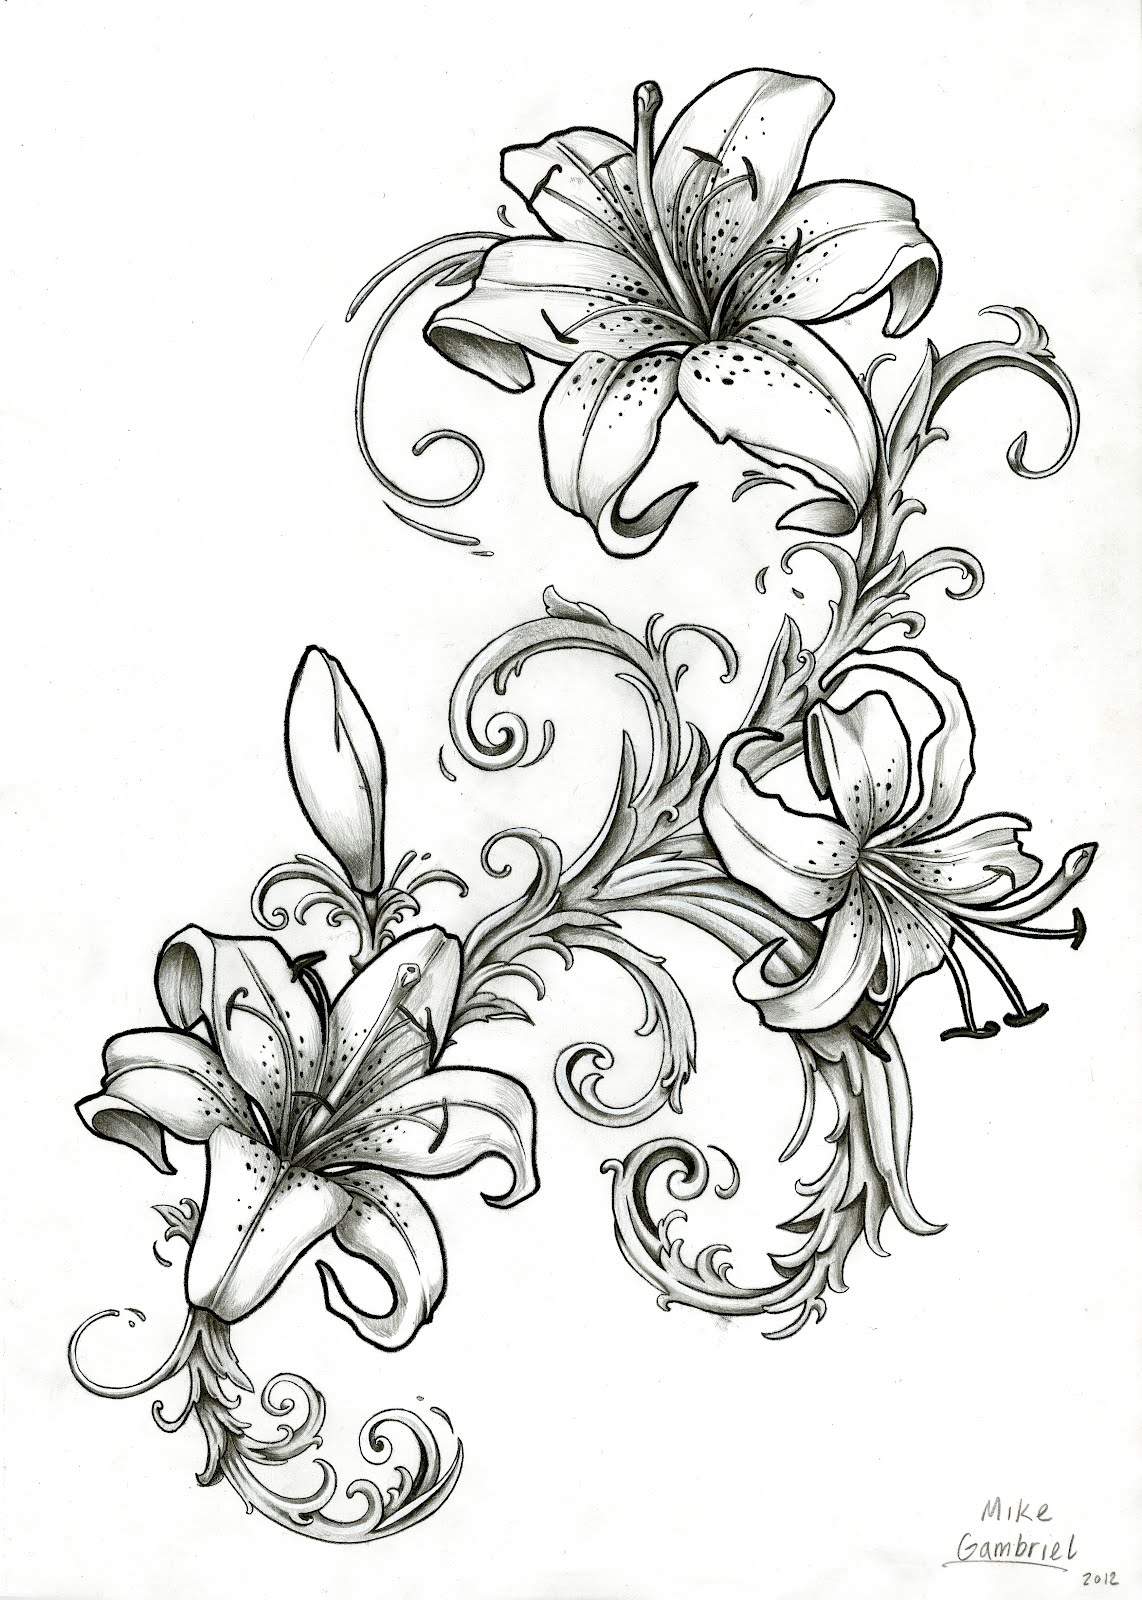 Mike's TATTOO design: Tiger Lillies